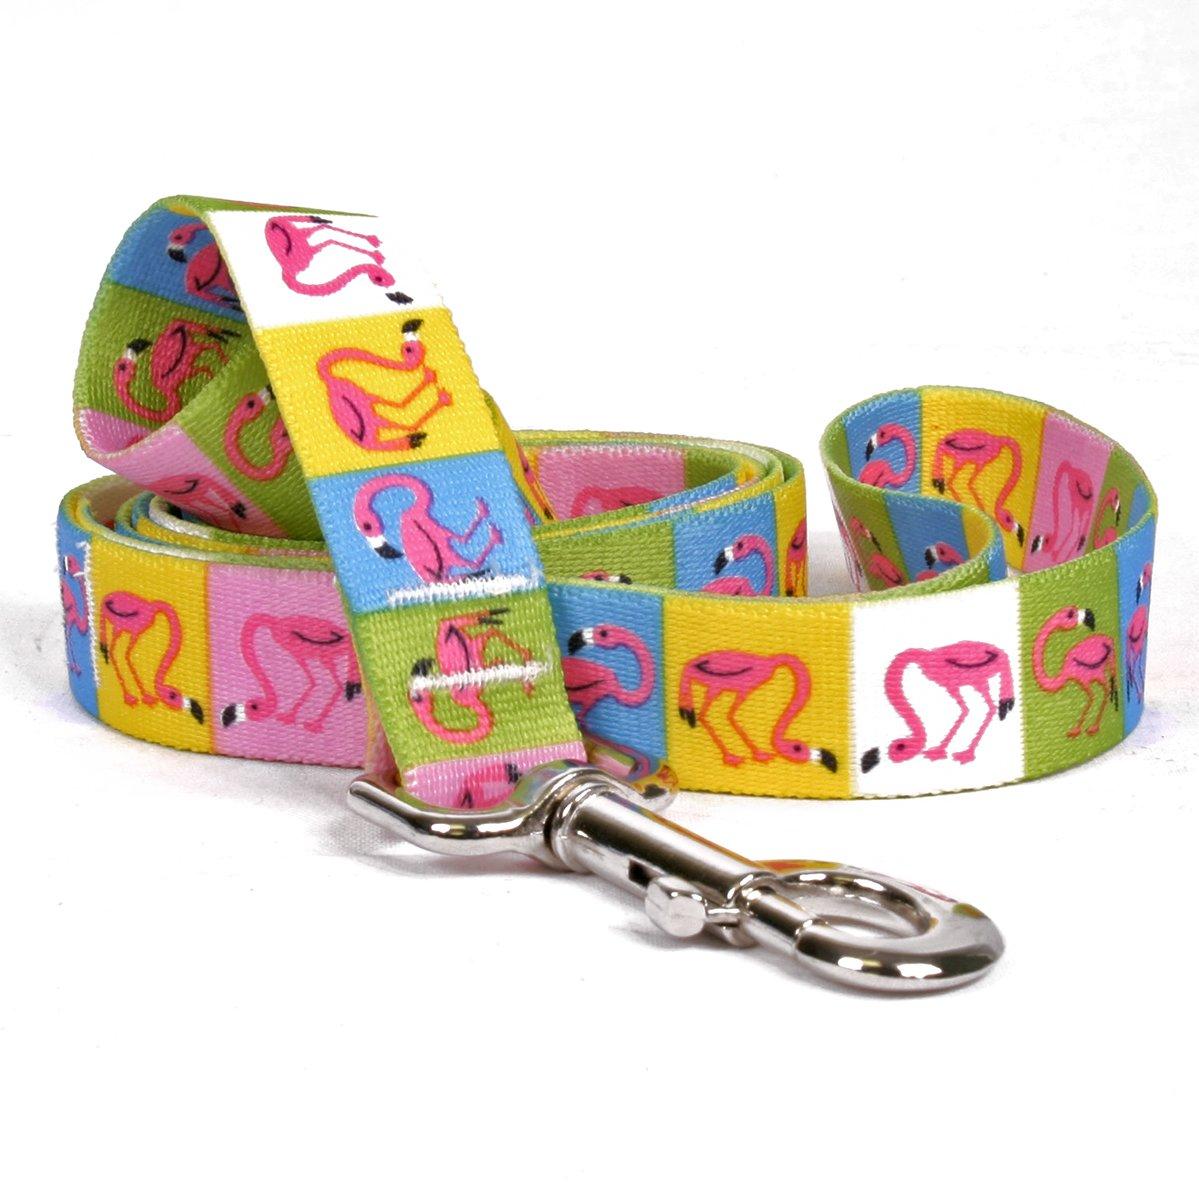 Yellow Dog Design Pink Flamingo Dog Leash, Small/Medium-3/4'' Wide and 5' (60'') long